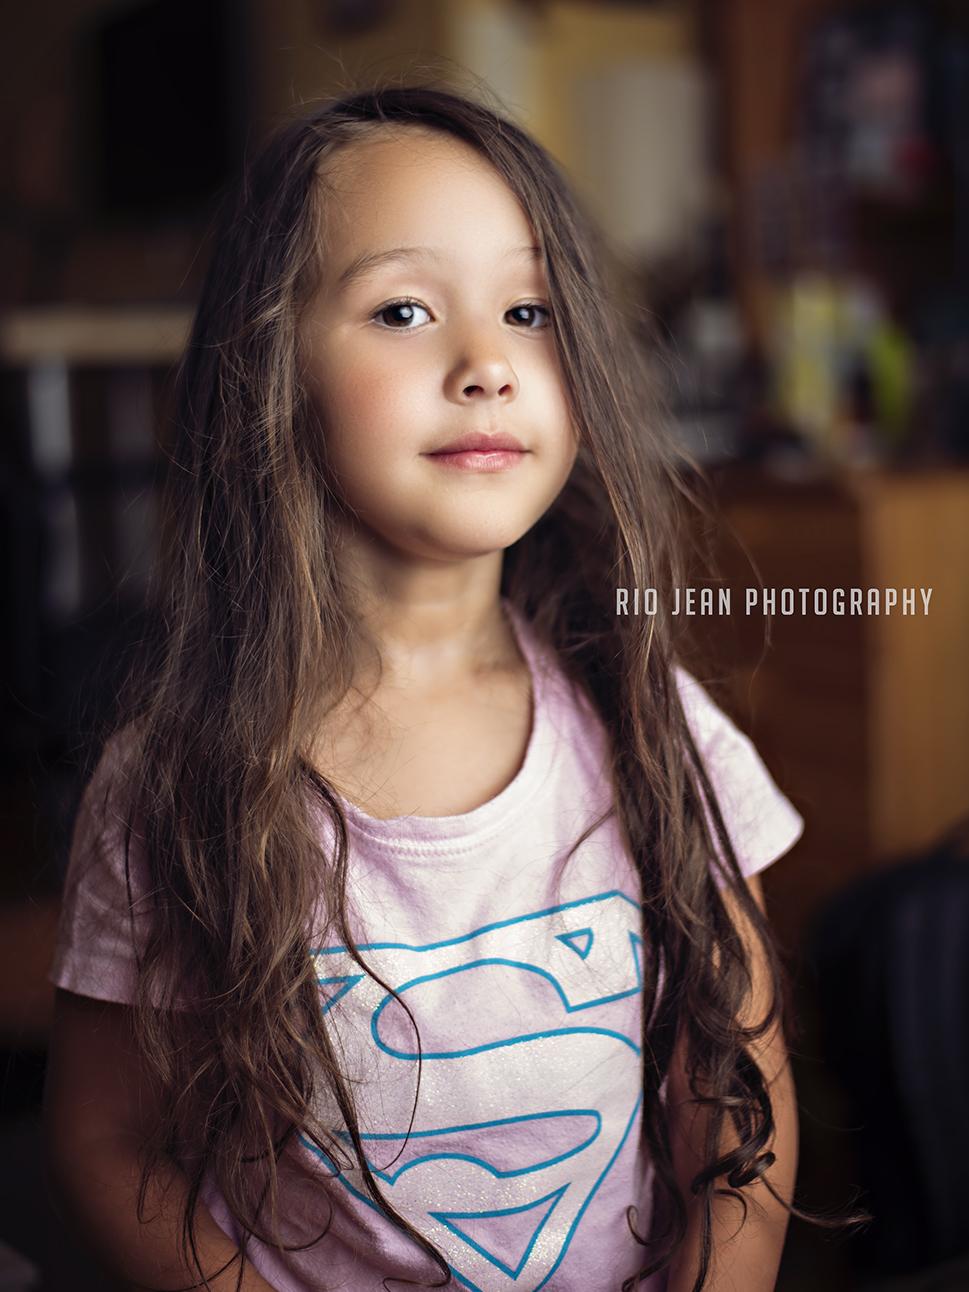 Rio Jean Photography child portrait photographer Studio lighting